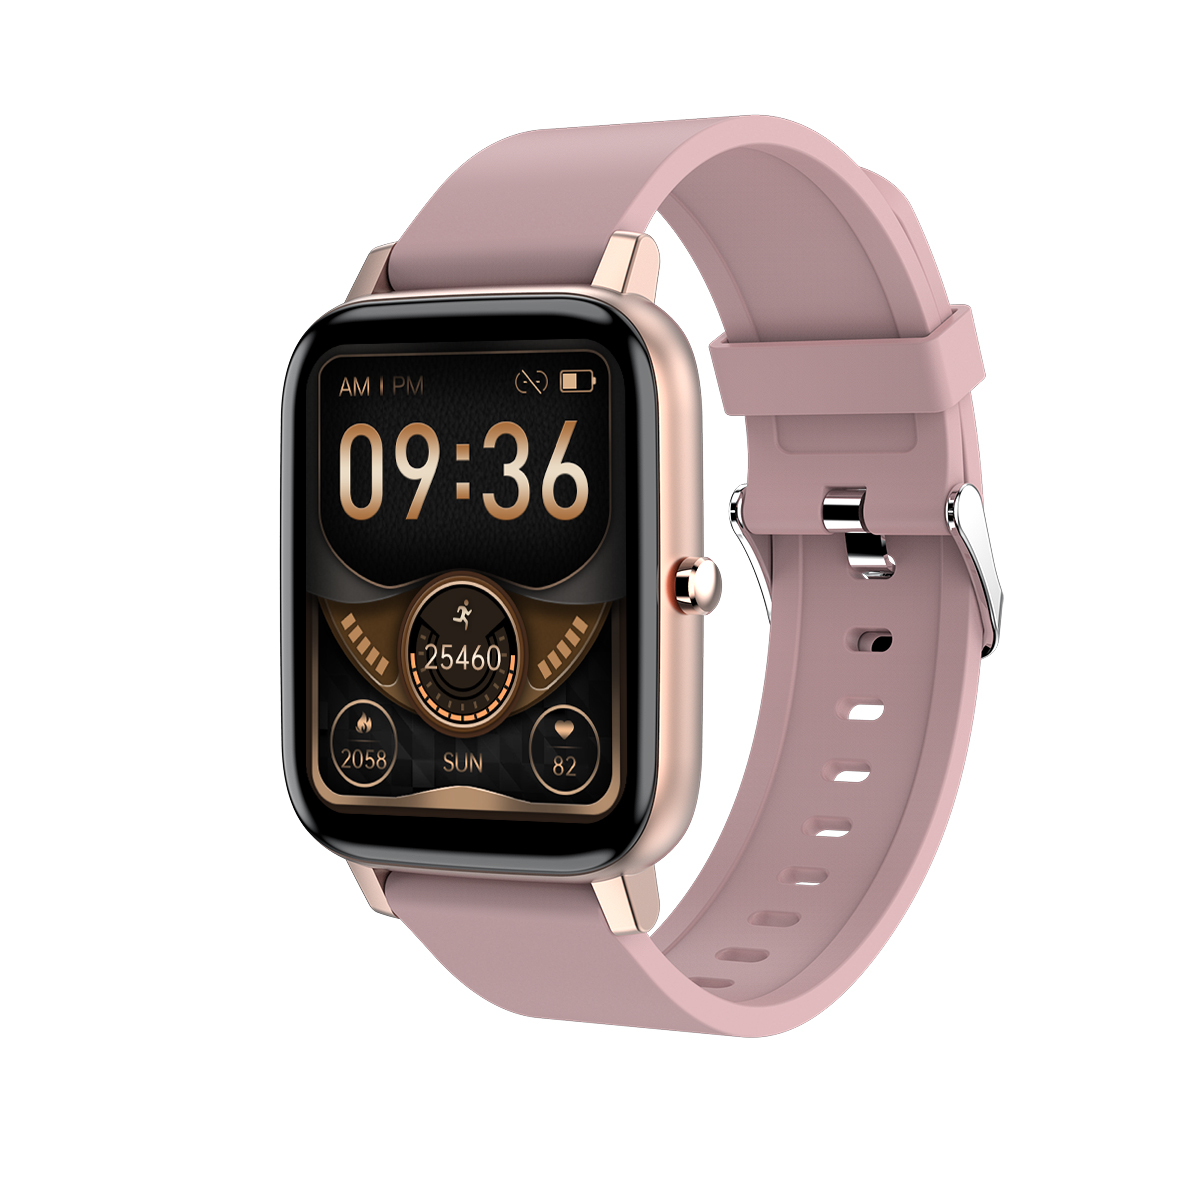 2020 woman's Smart watch 1.69 inch IP67 waterproof sports watches women Heart Rate Tracker Smartwatch for apple xiaomi H80